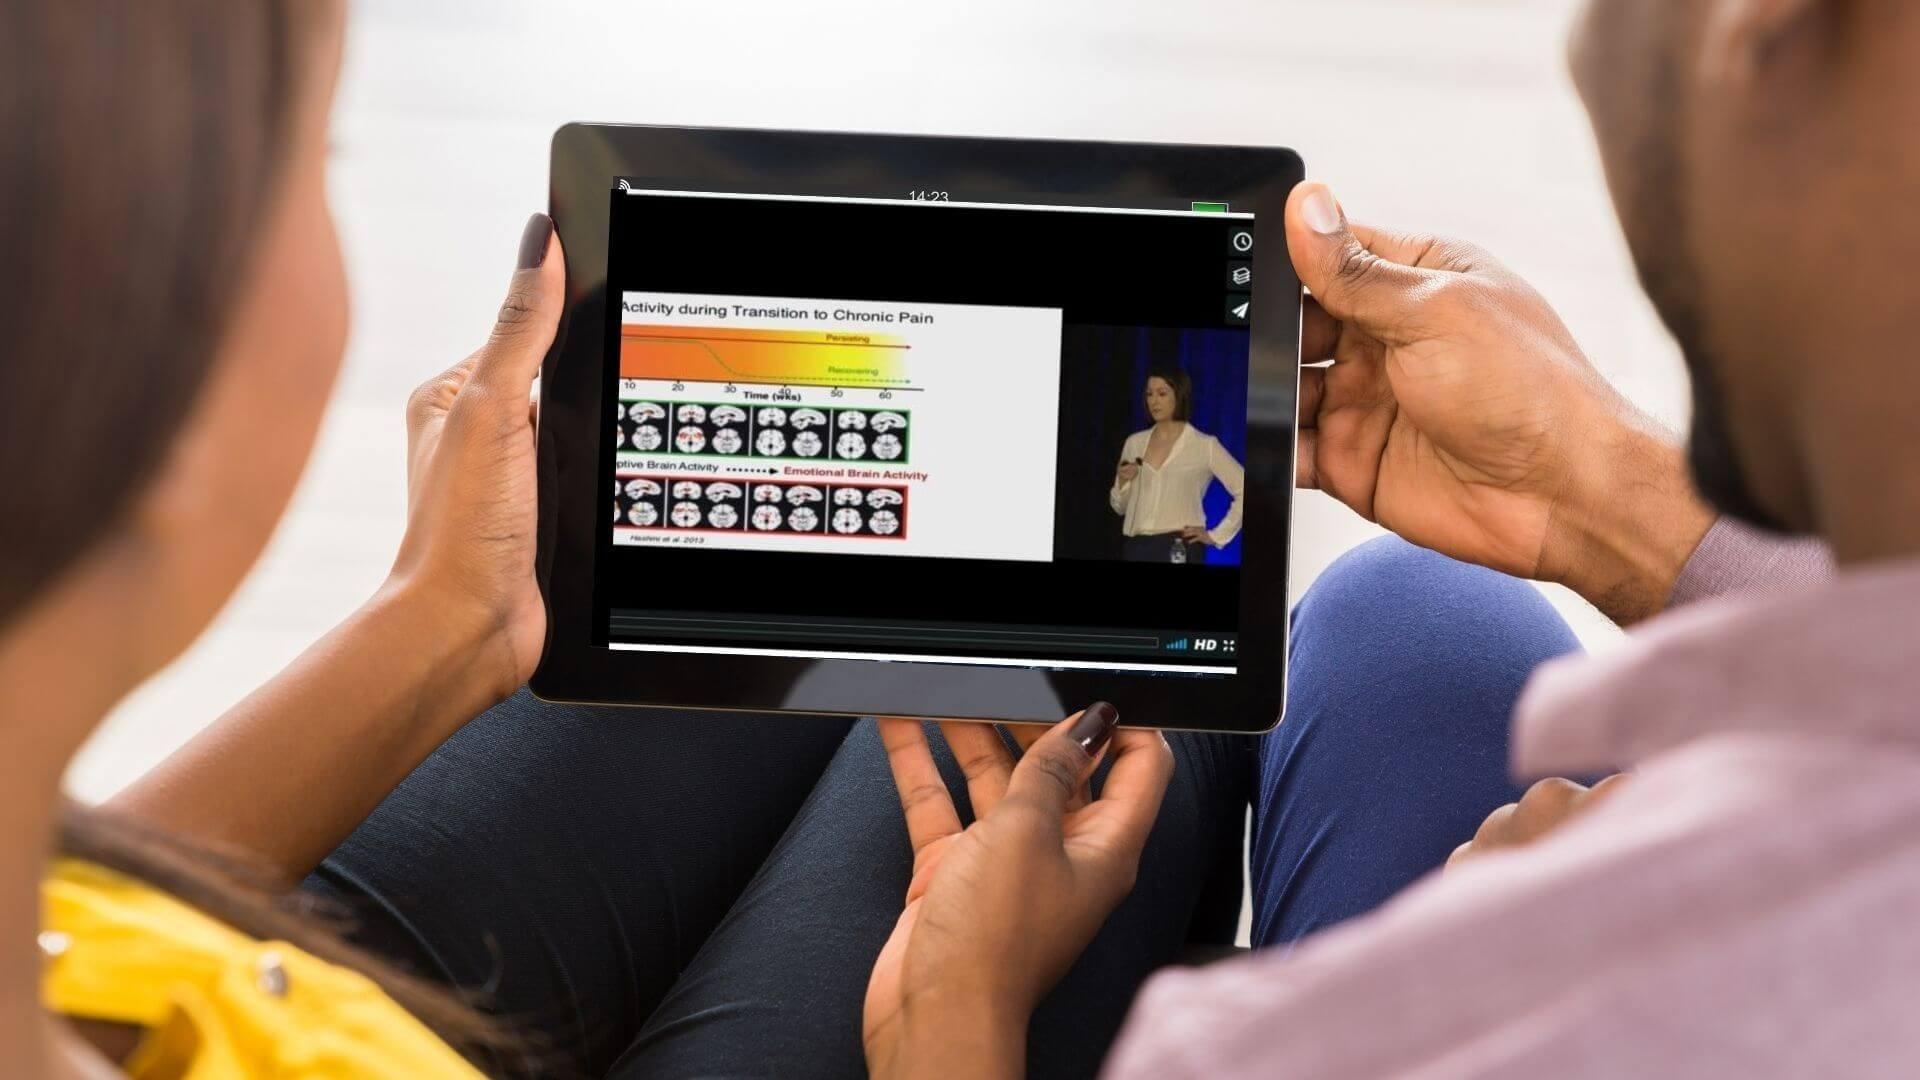 woman man holding ipad watching video